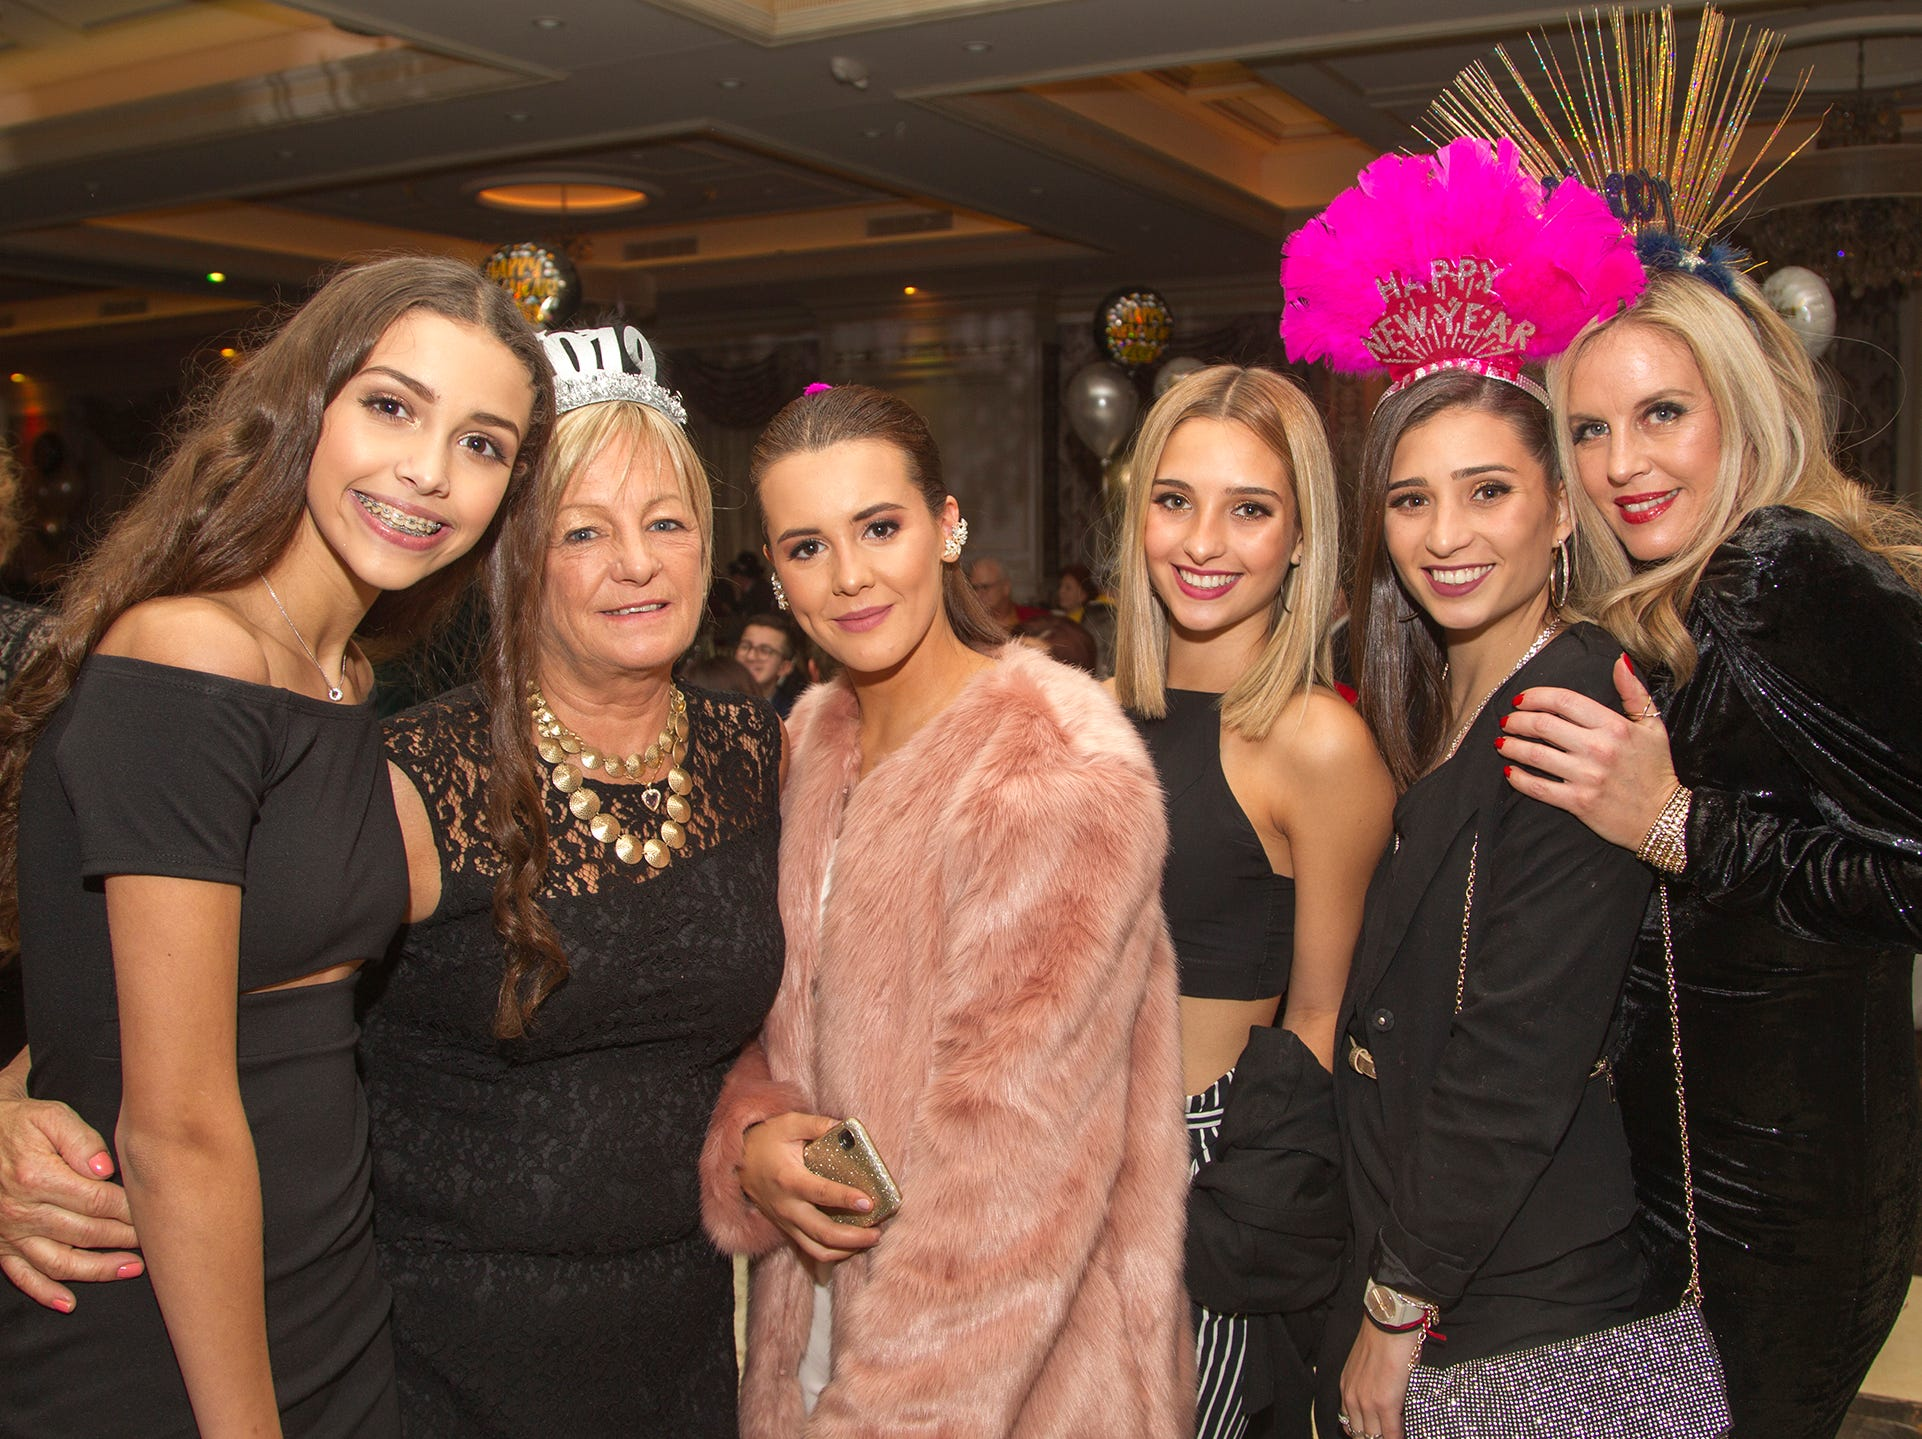 Biagio's Ristorante 2018 New Year's Eve celebration in Paramus. 12/31/2018